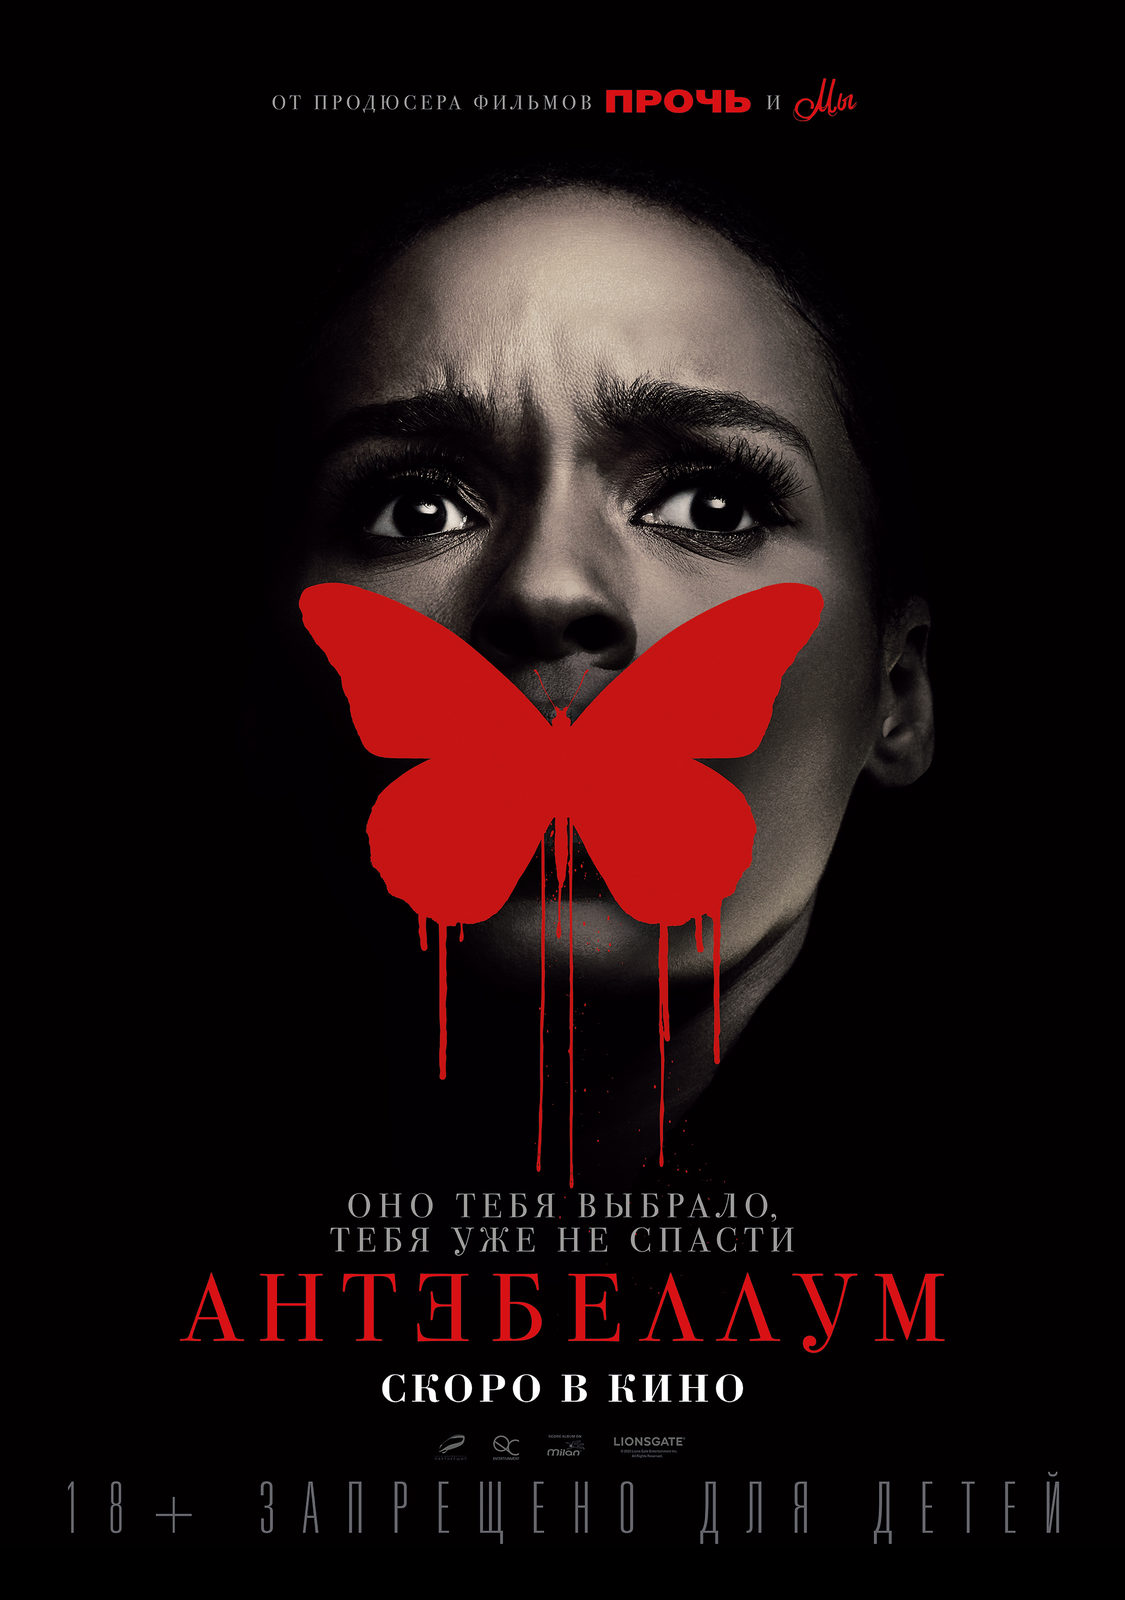 антебеллум постер 2020